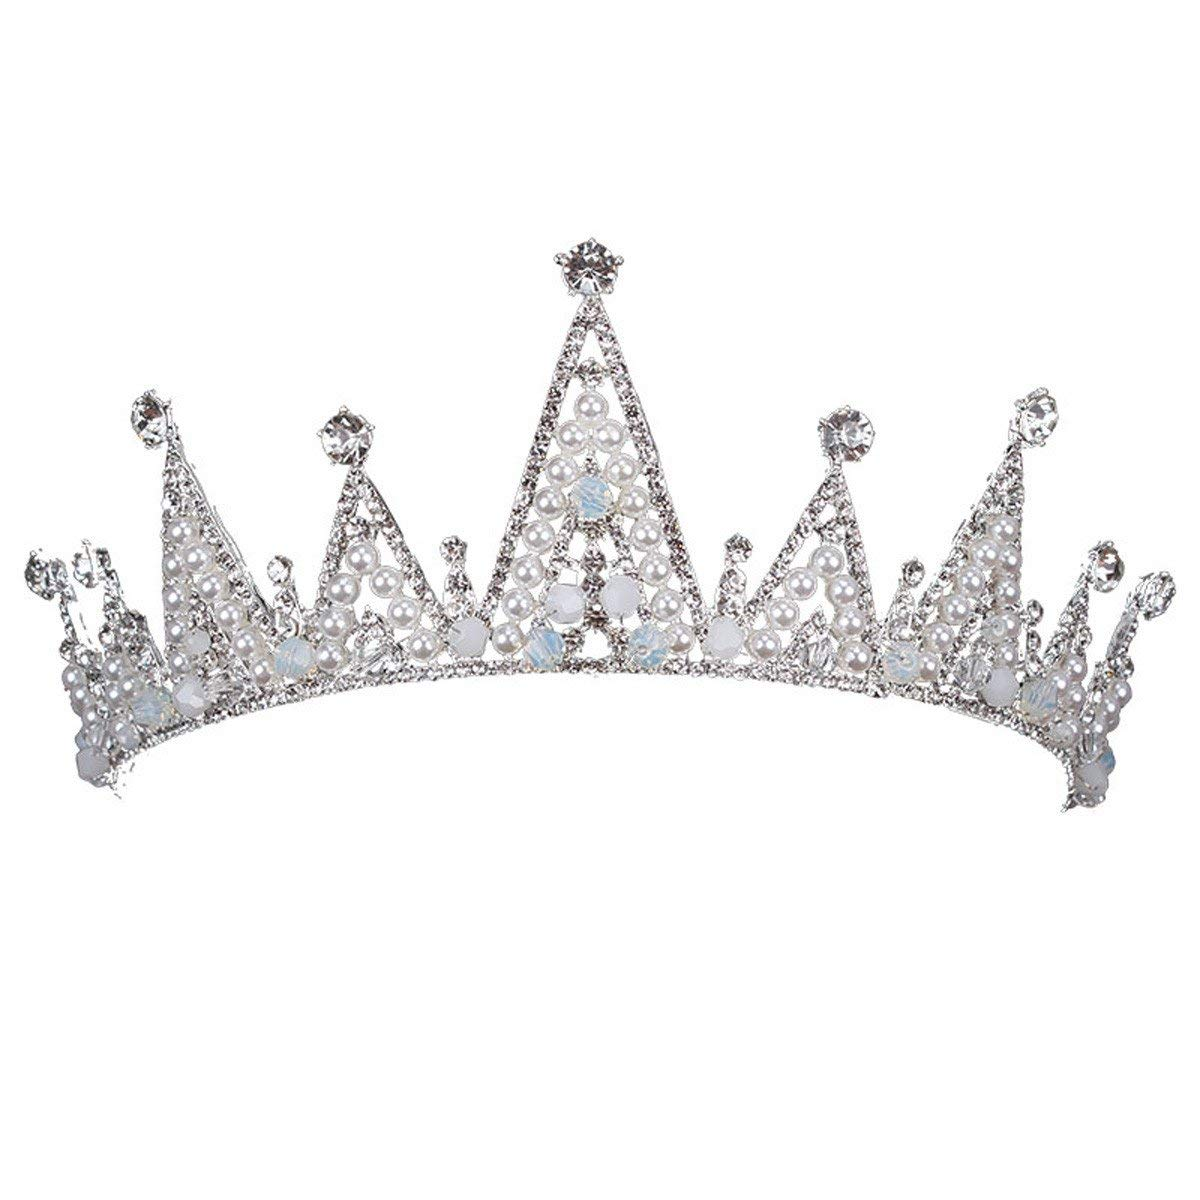 Crystal Crown, New Crown Ornaments Bridal Pearl Crown Crystal Princess Crown Wedding Dresses Dresses And Accessories.